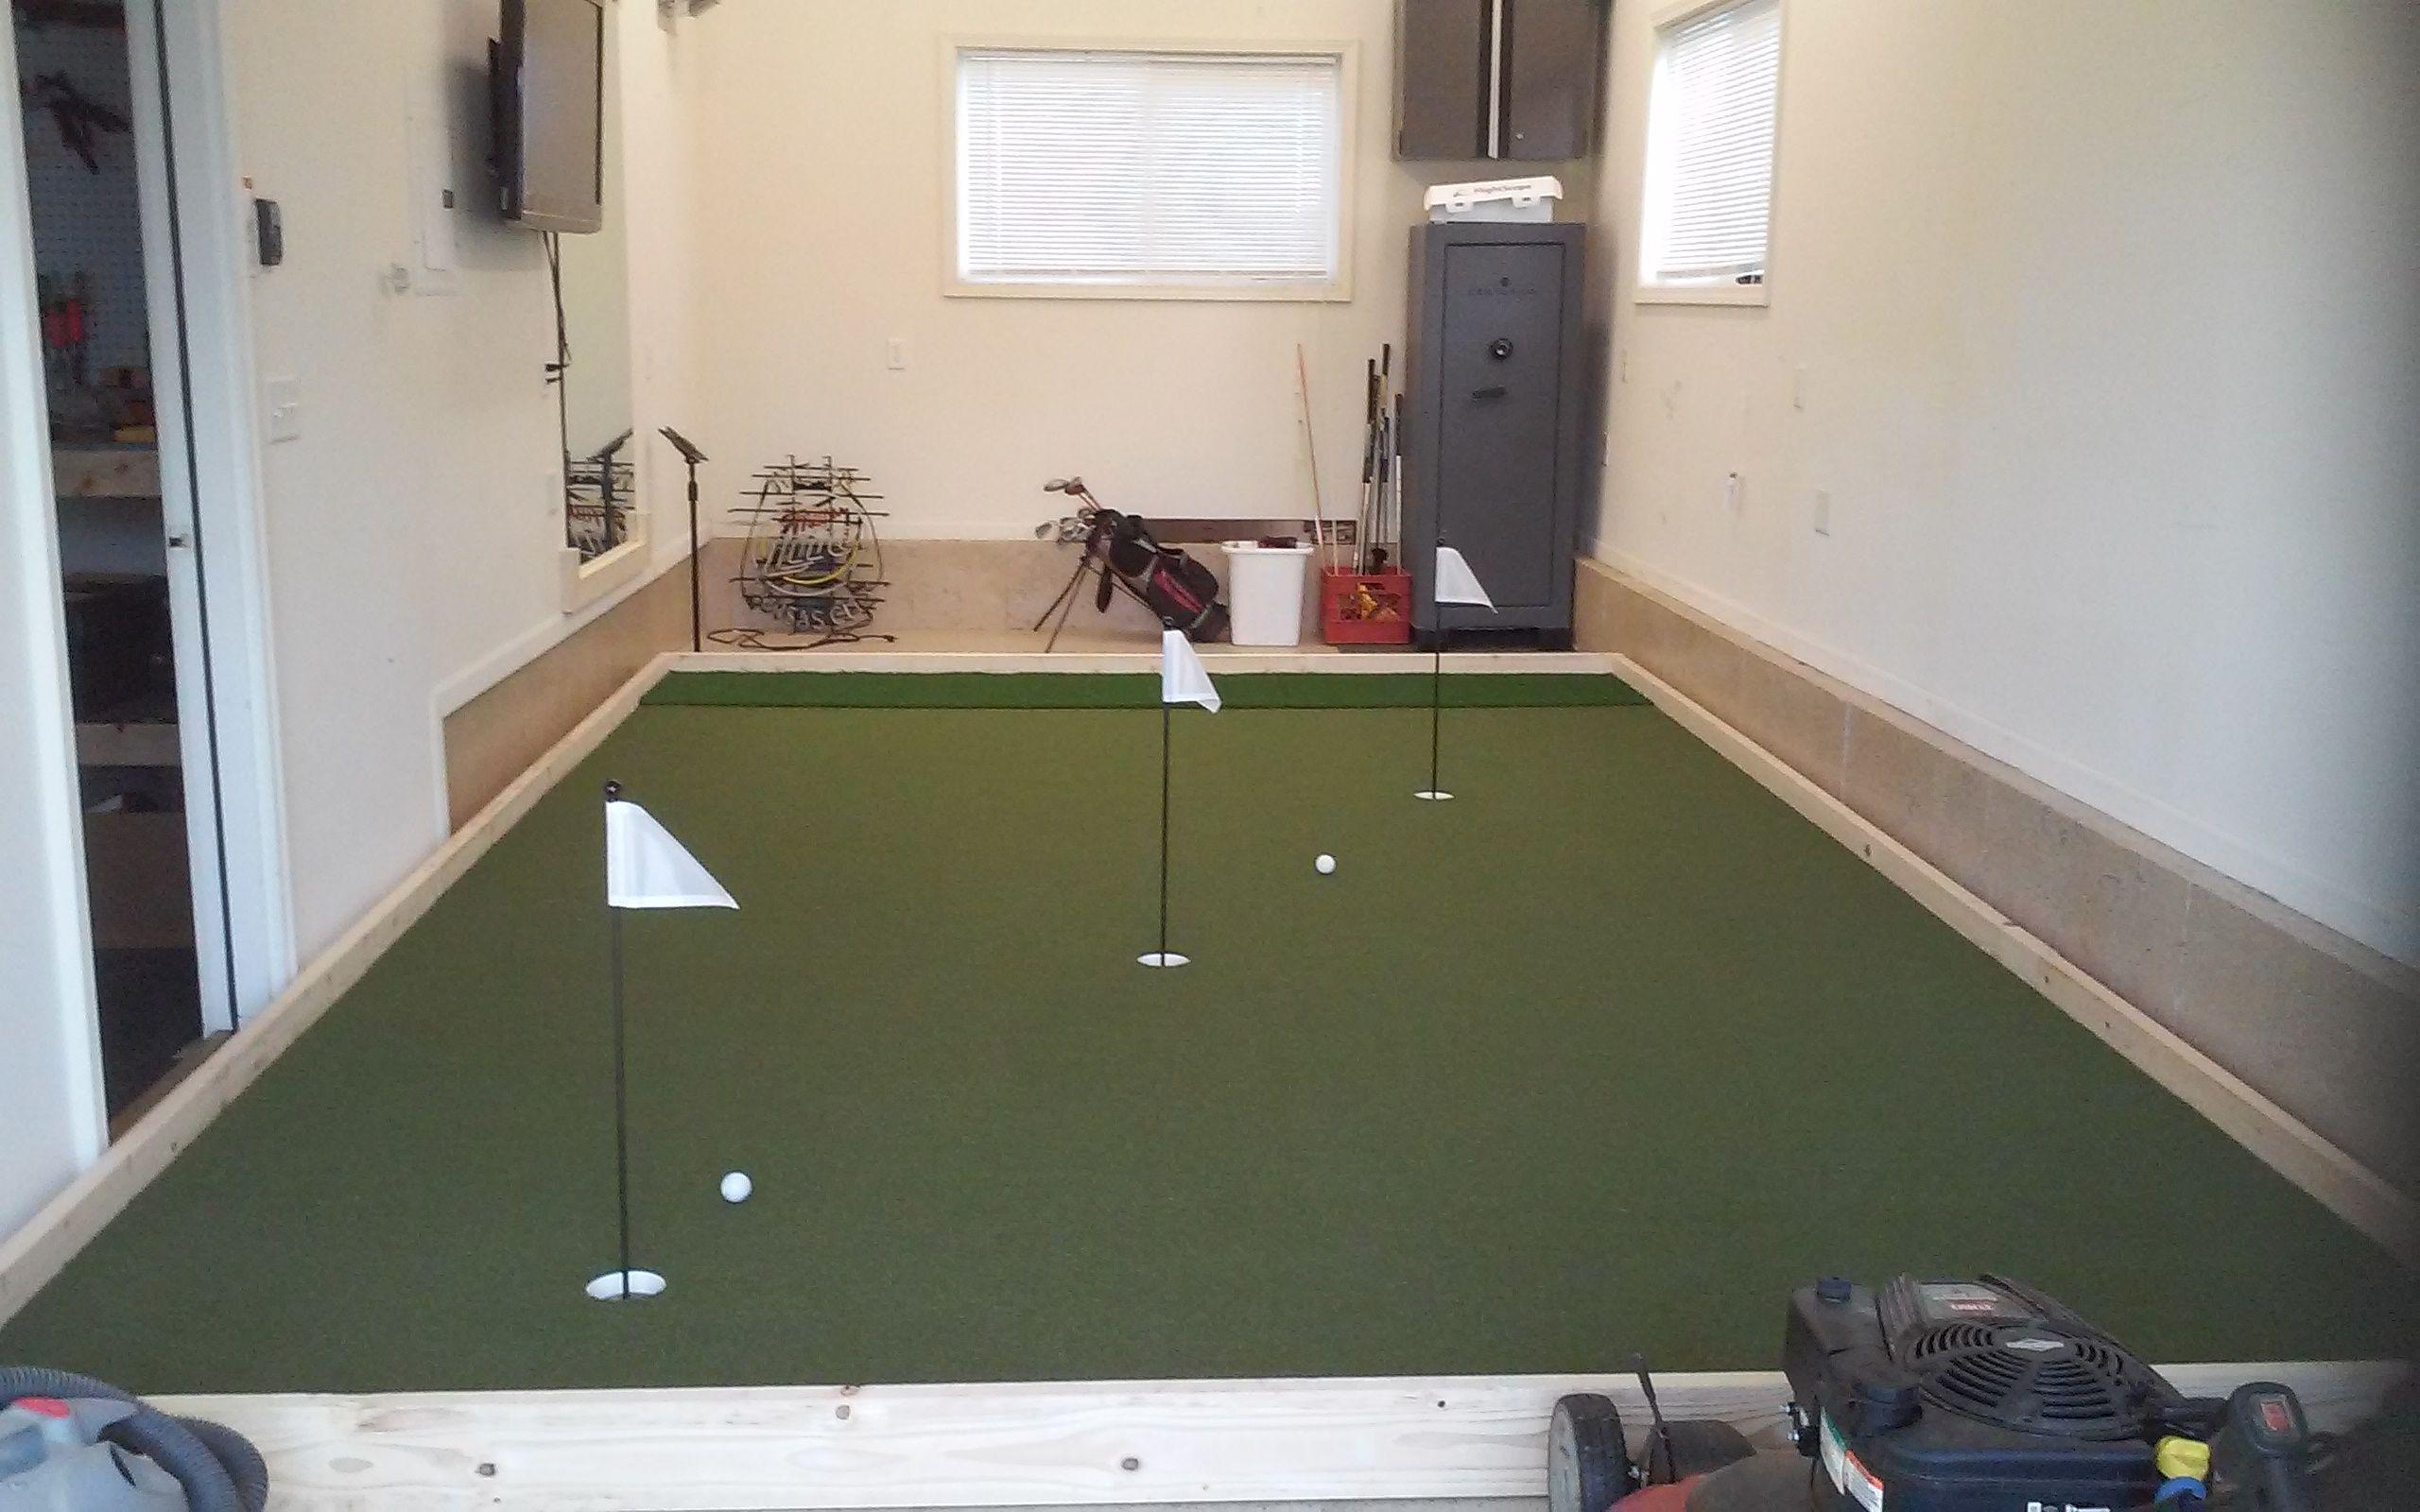 3rd car garage man cave synlawn golf putting green what a